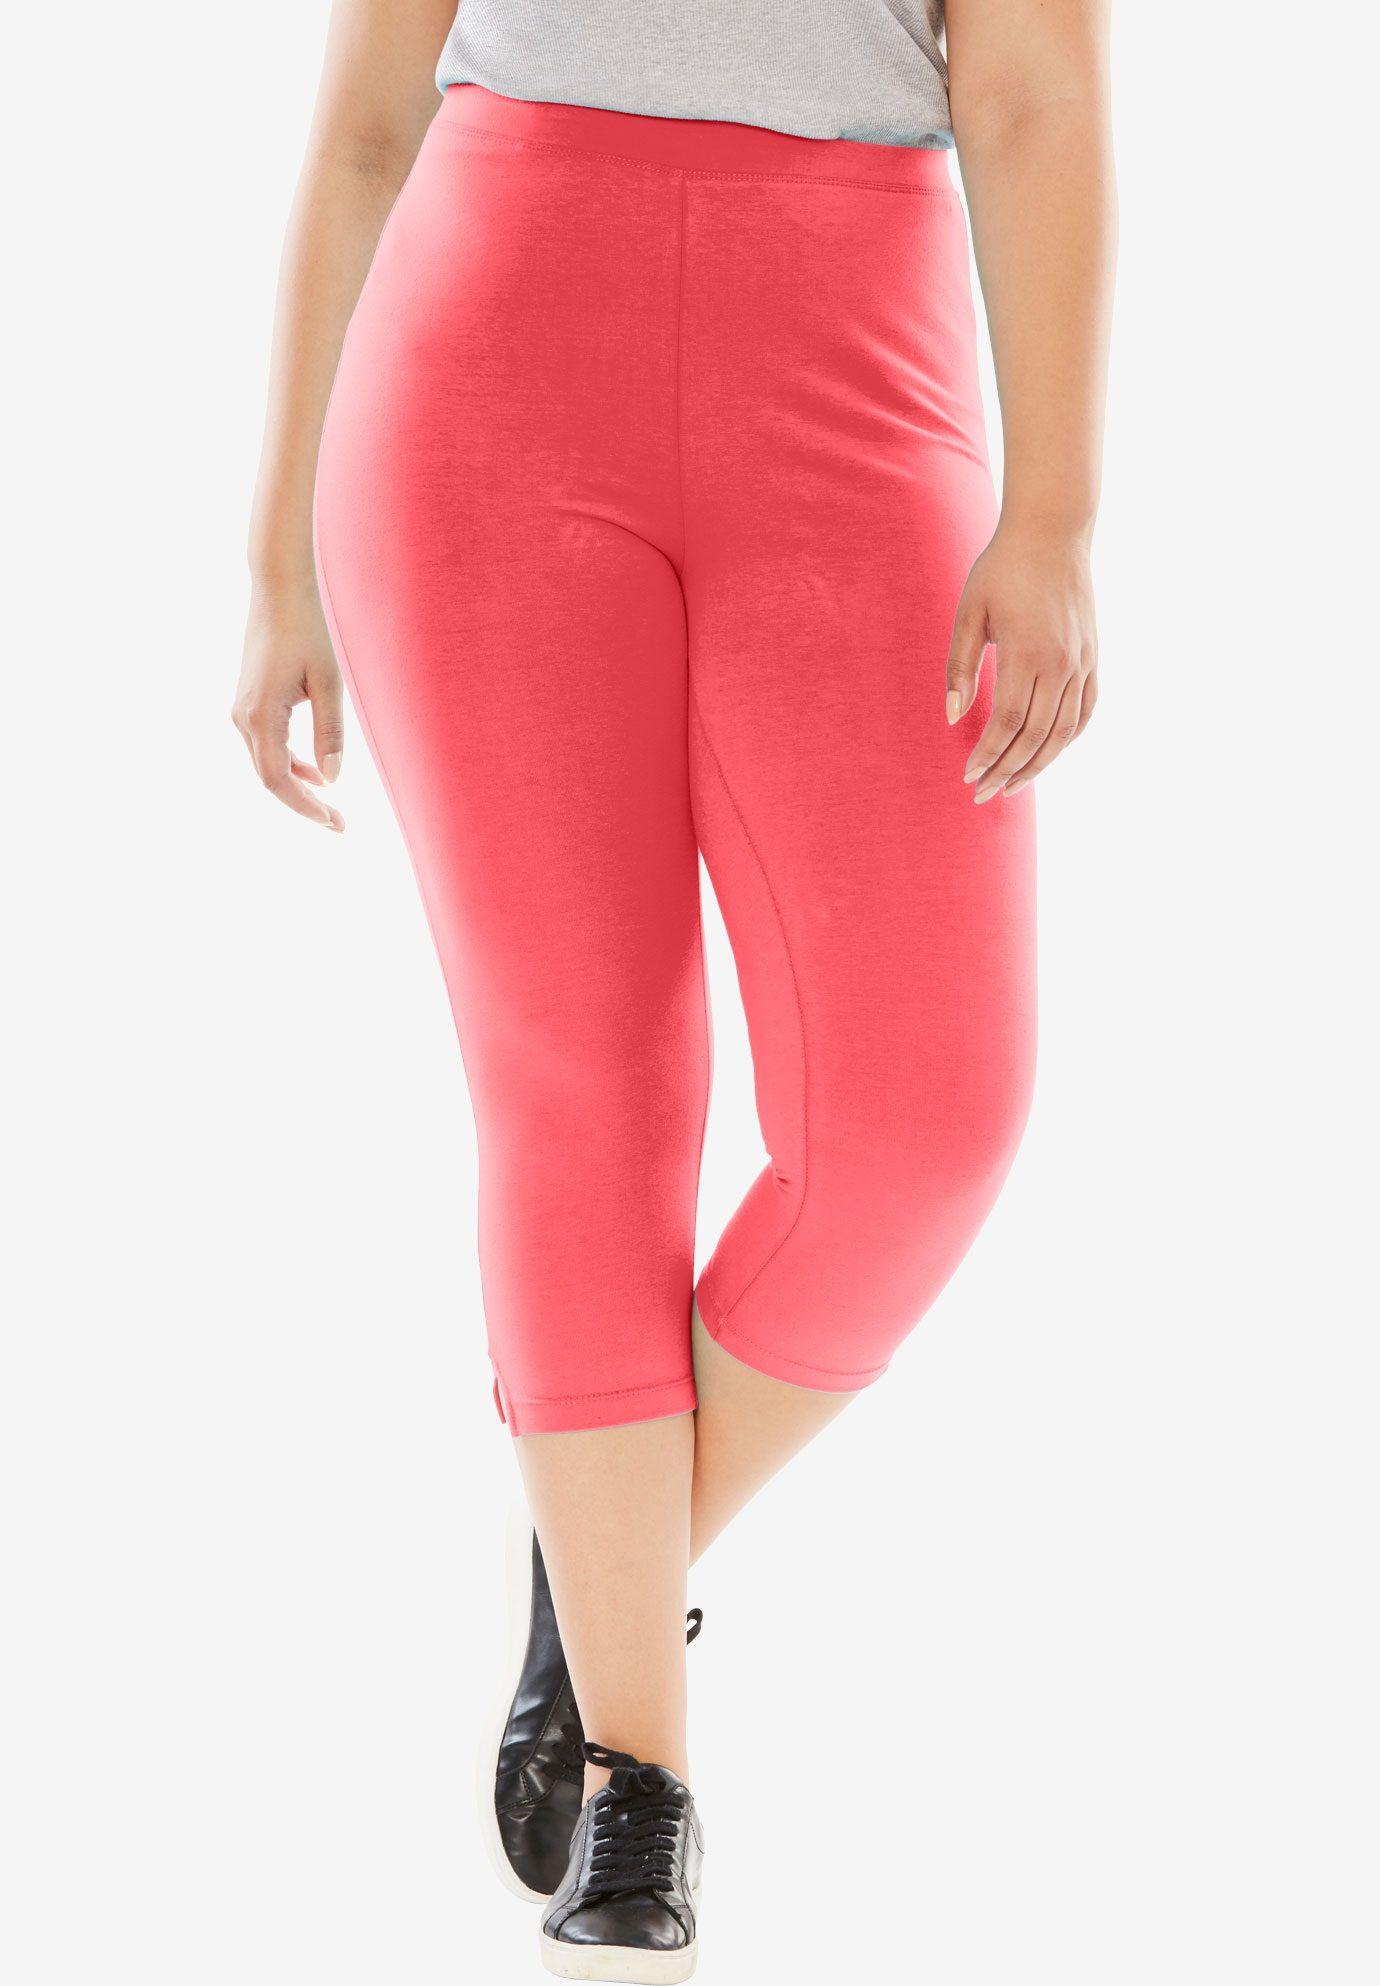 67e082b6e82c3 Stretch Cotton Capri Legging - Women's Plus Size Clothing | Products ...